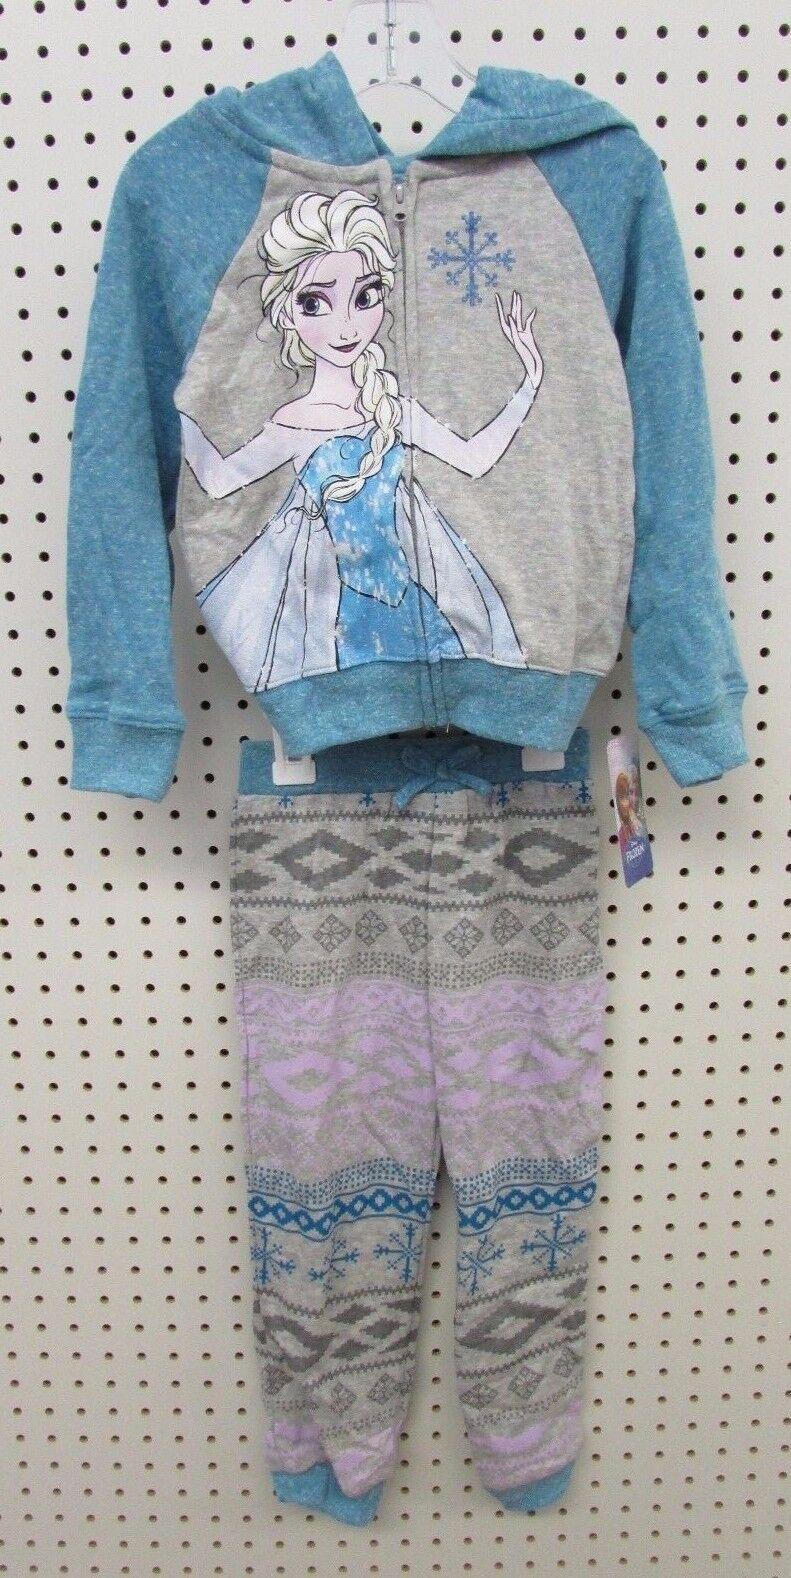 Disney Frozen's Elsa - Size: 4T Toddler Girl's  2-Piece Jogg